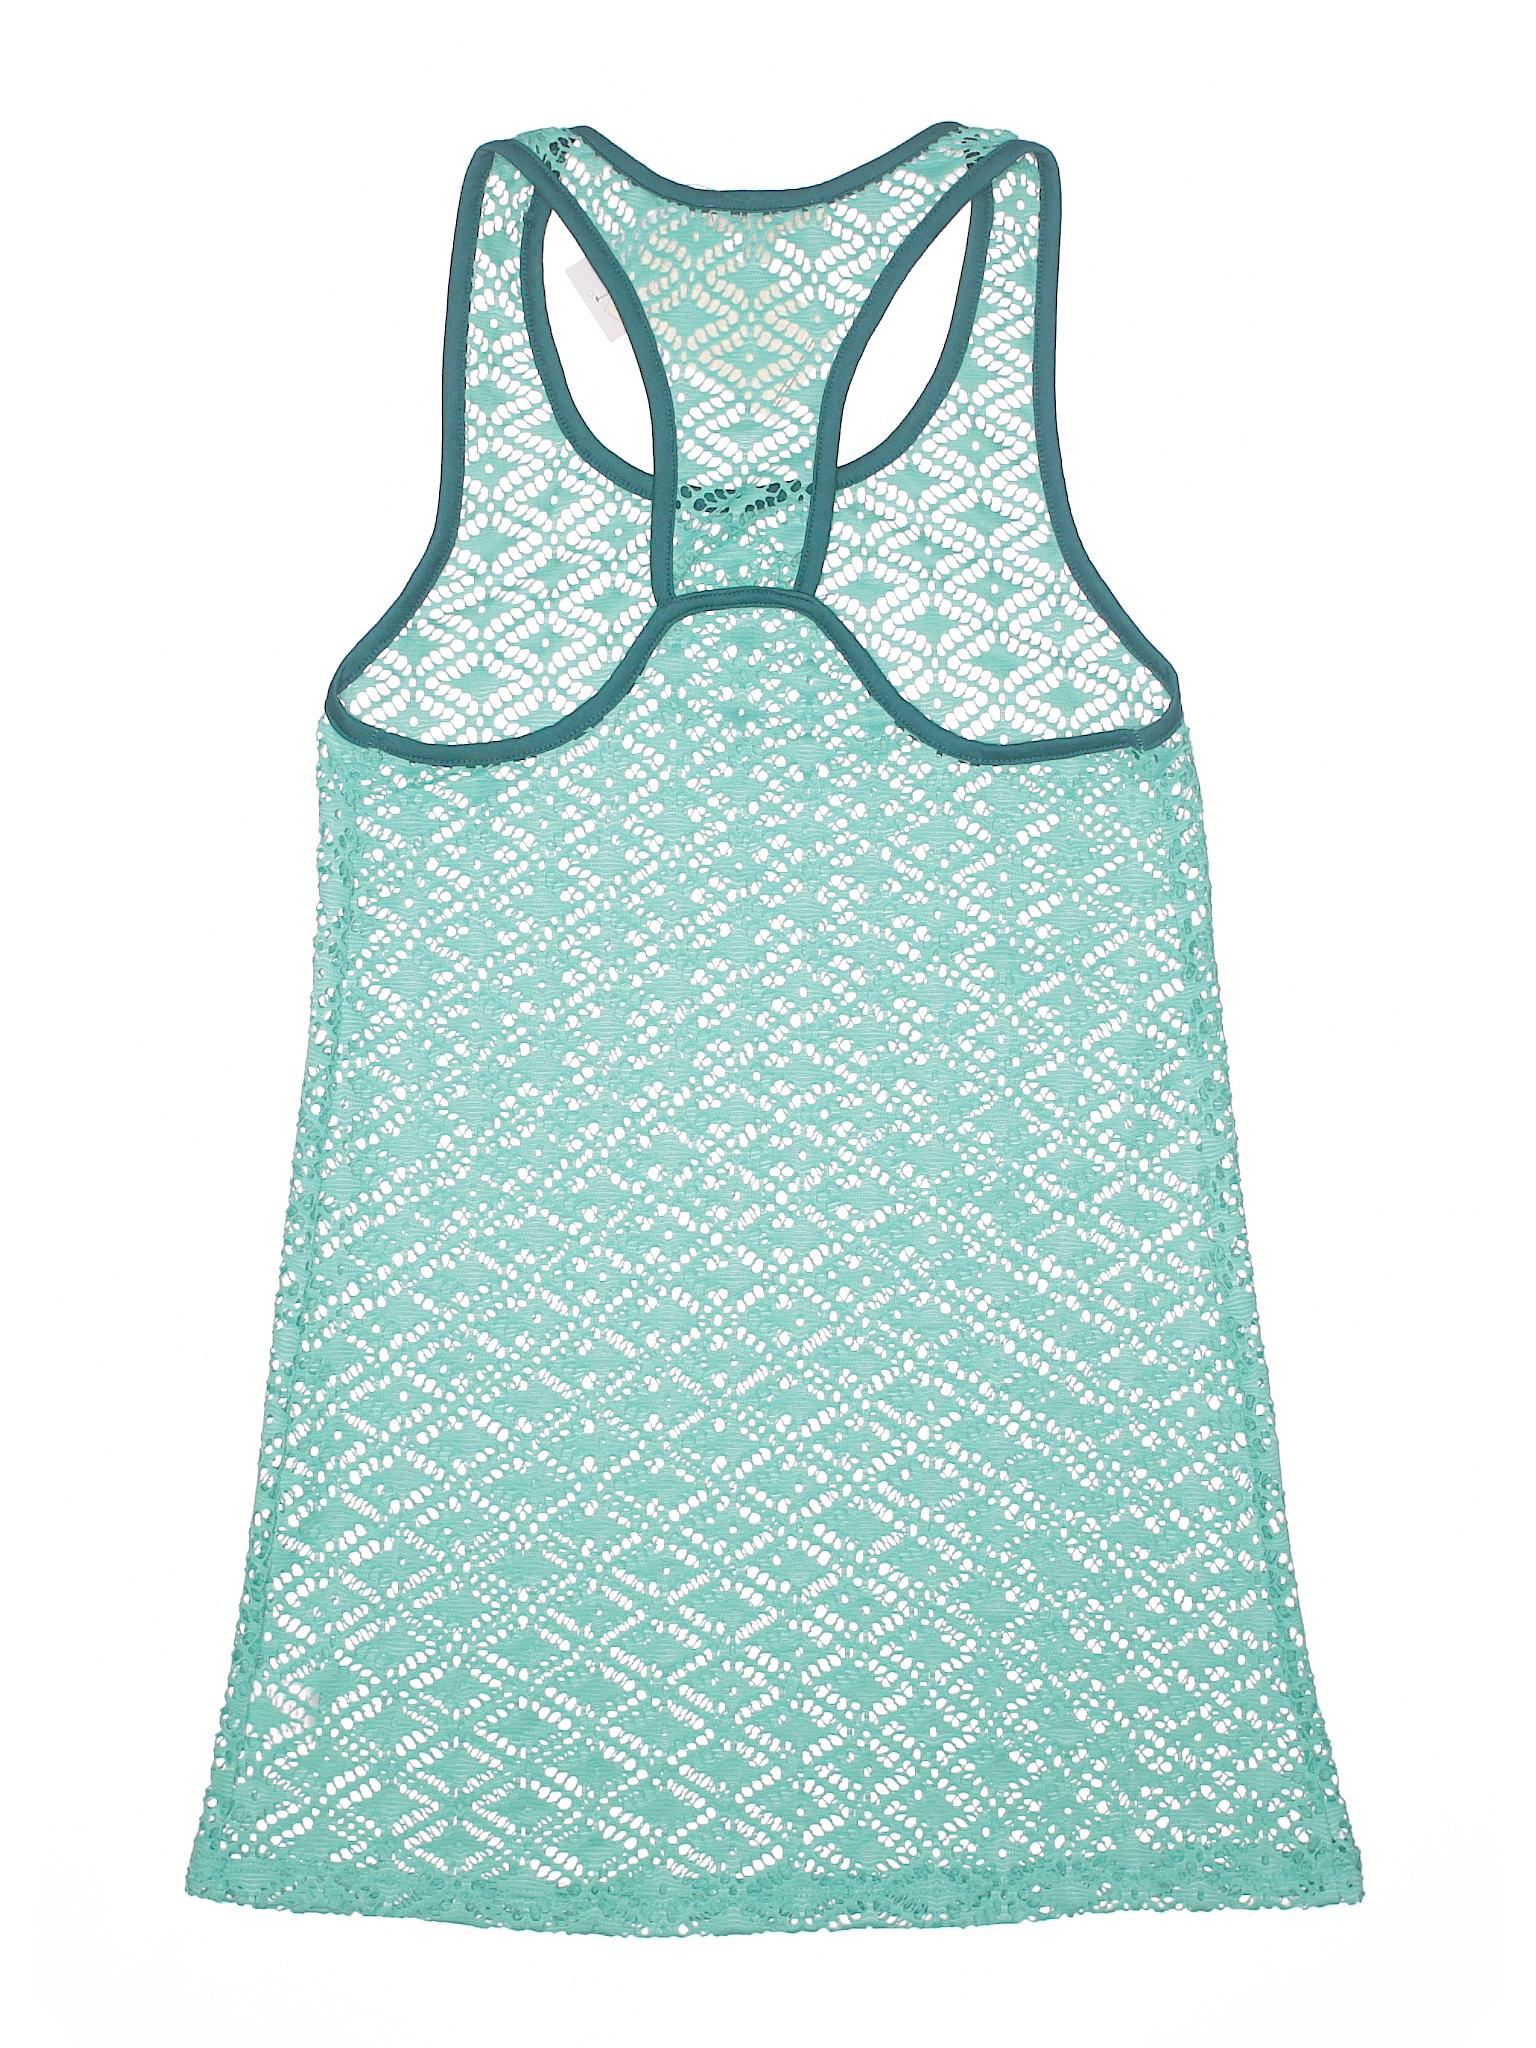 Up Miken Boutique Swimsuit Cover SudX9vNNoj Clothing wgXRXqBy